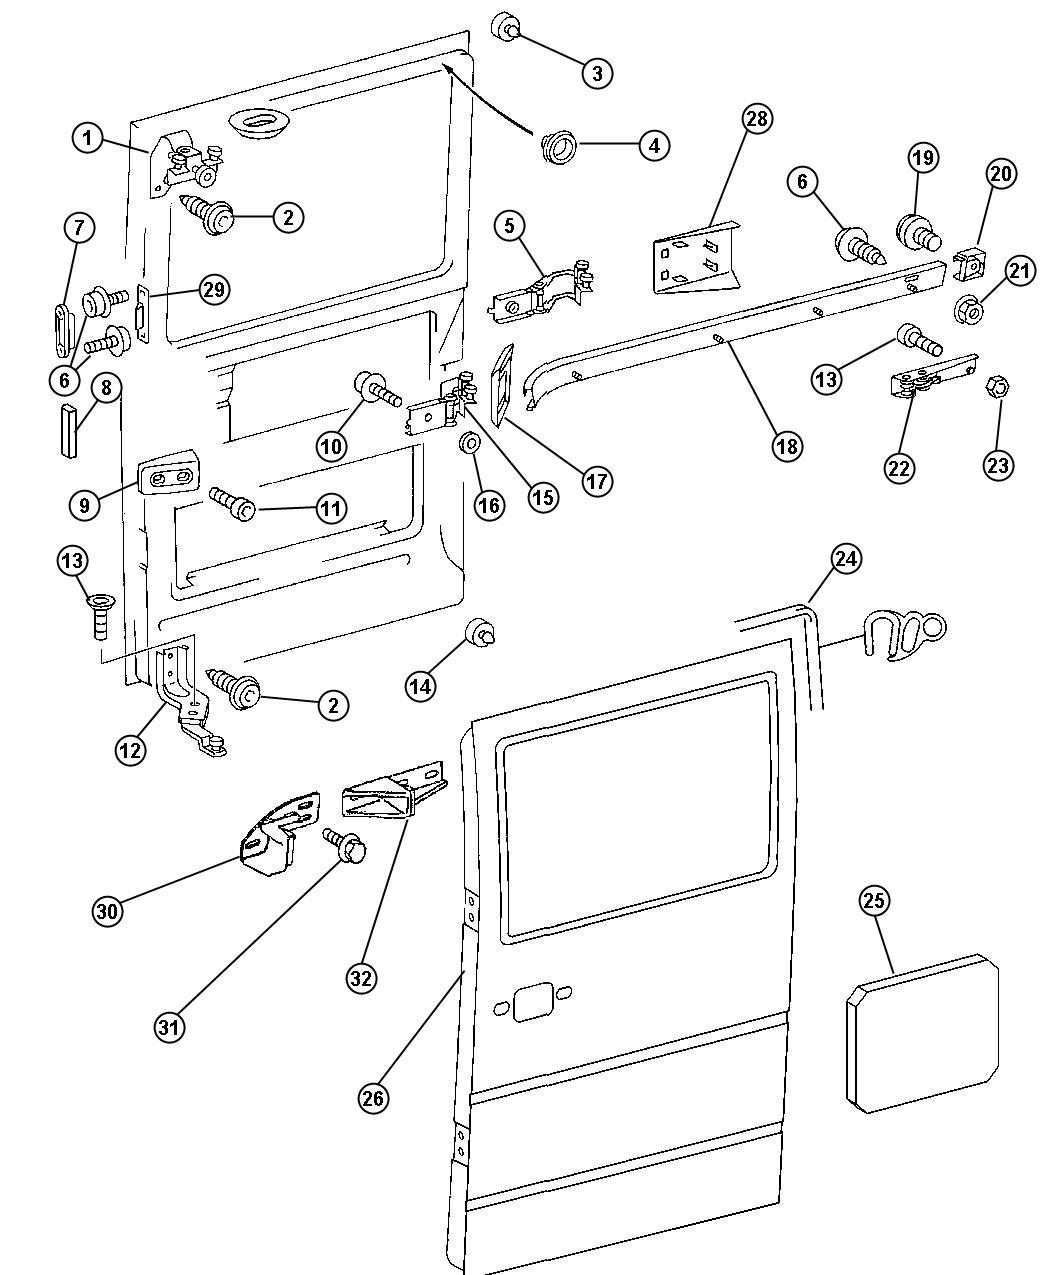 Sliding Door Parts May